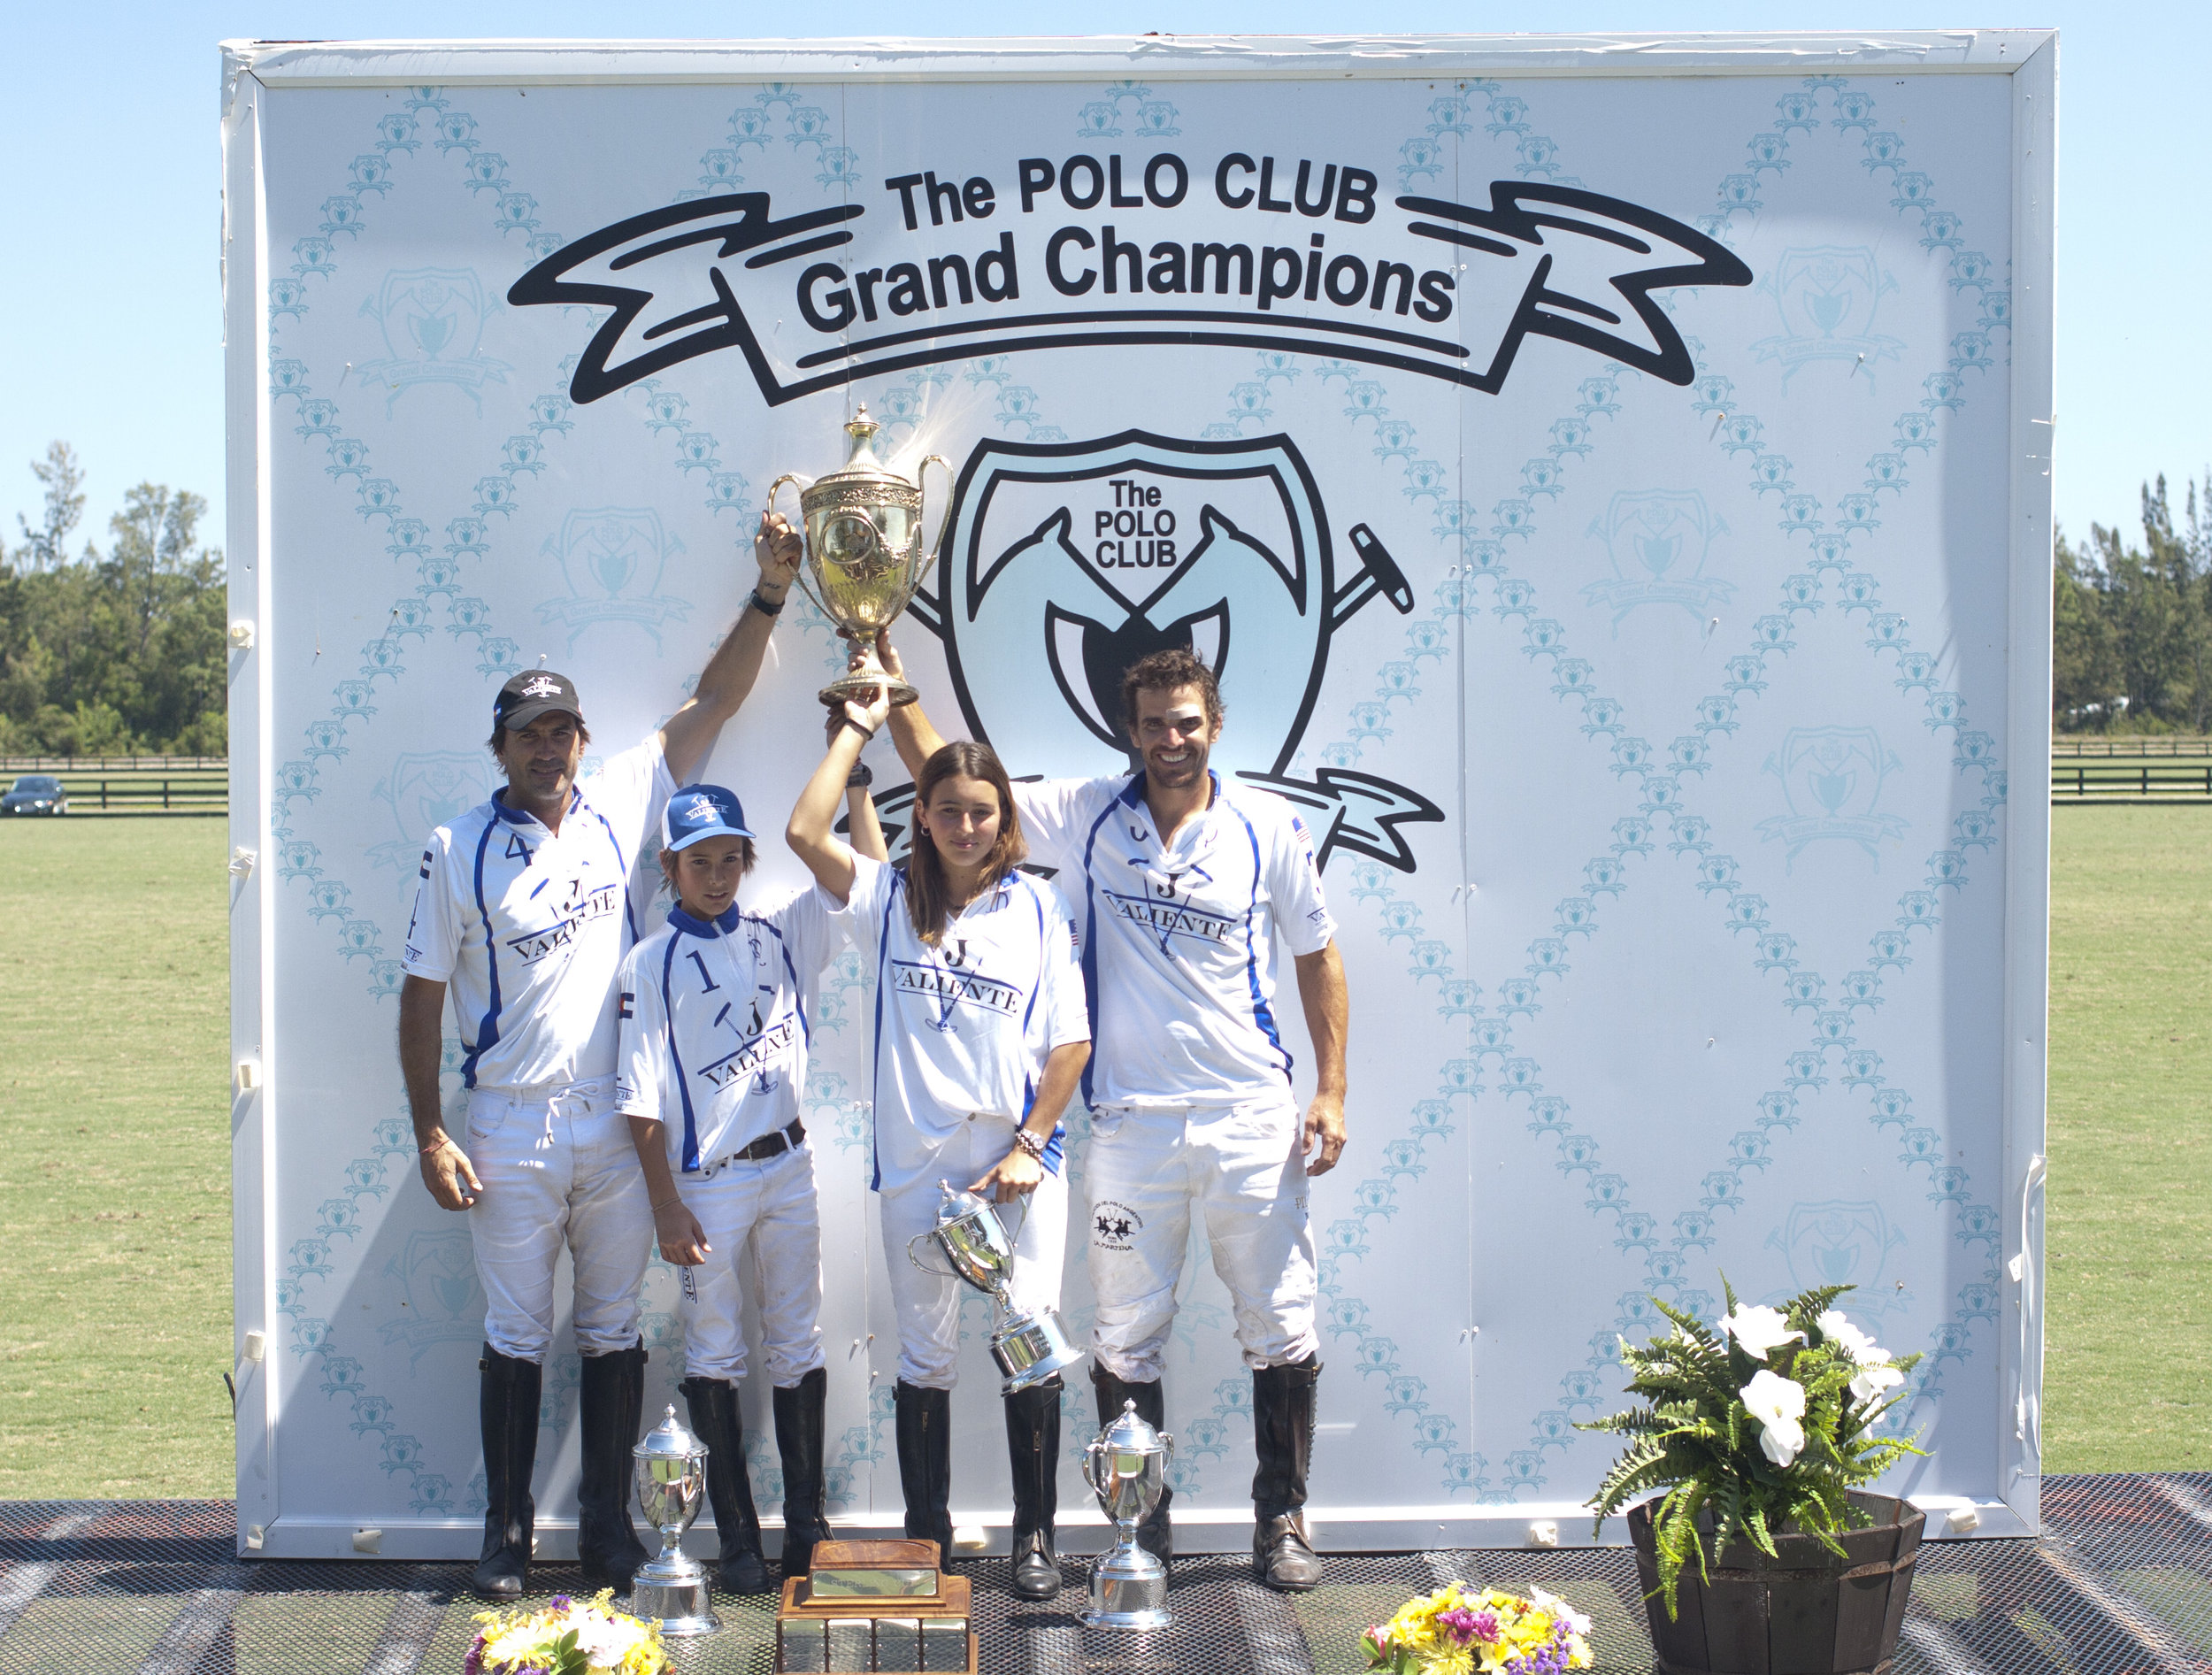 Sterling Cup champion Valiente players Adolfo, Poroto and Mia Cambiaso and Magoo Laprida.